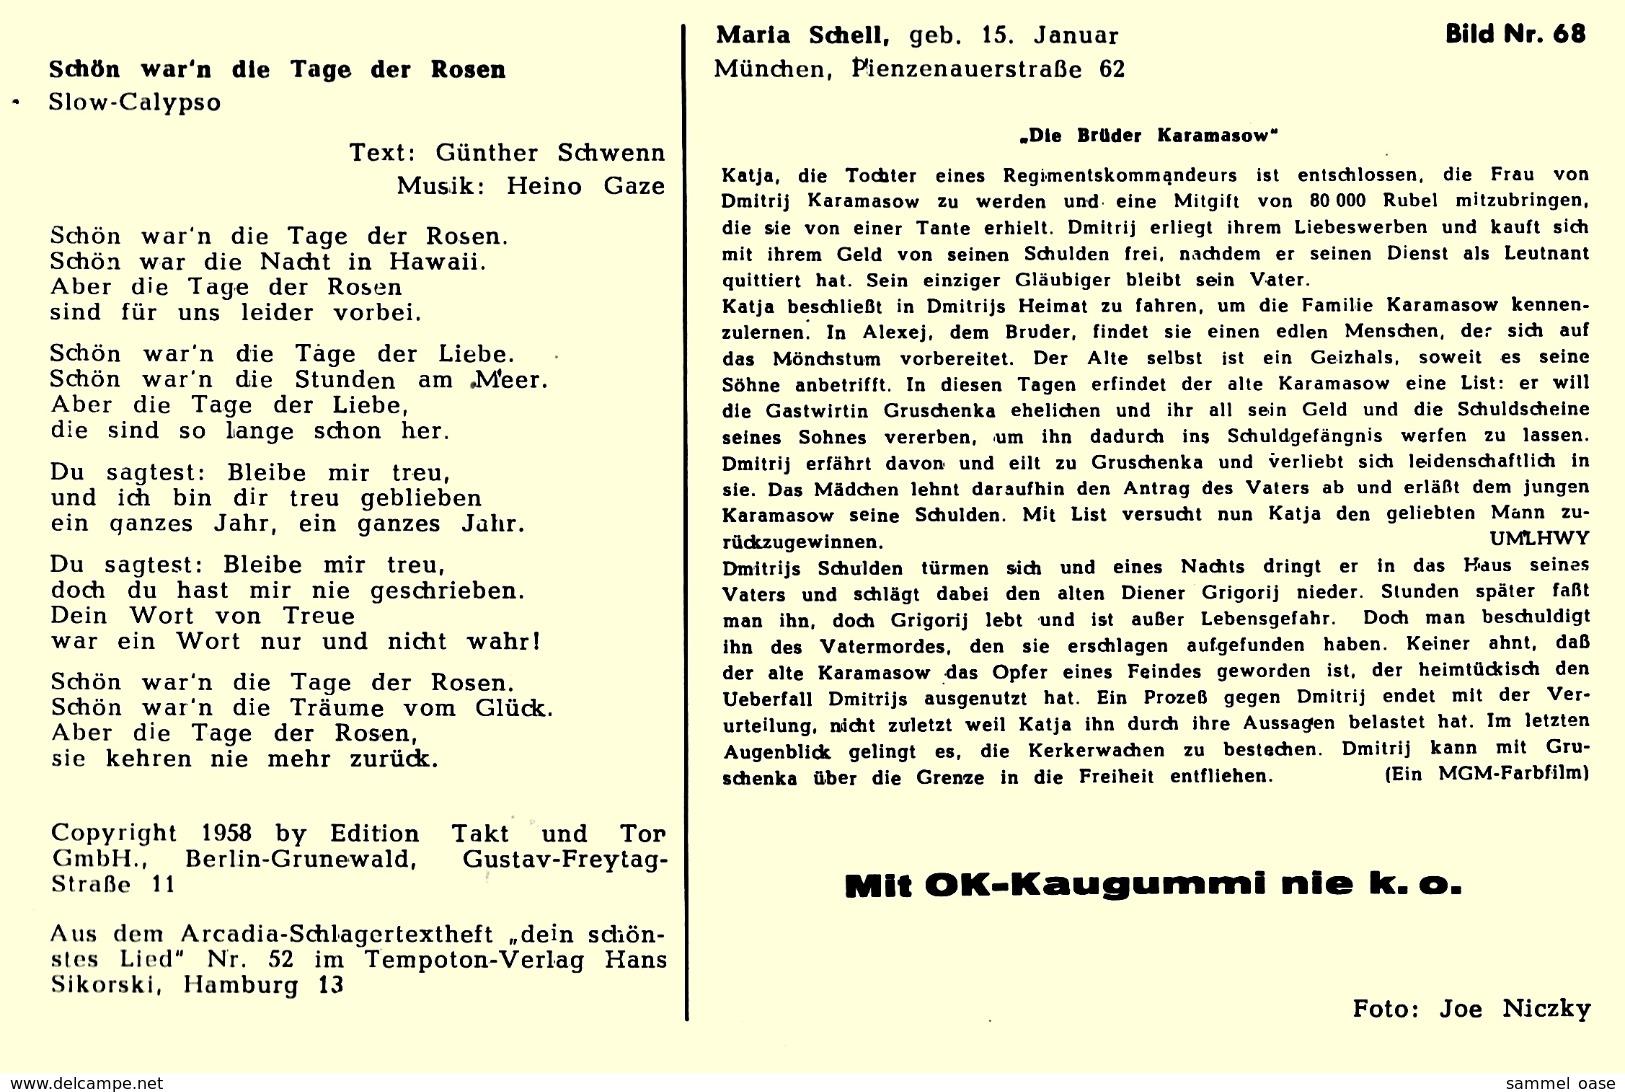 Ca. 1958  -  Sammelbild OK-Kaugummi  -  Maria Schell  -  Bild Nr. 68 - Süsswaren